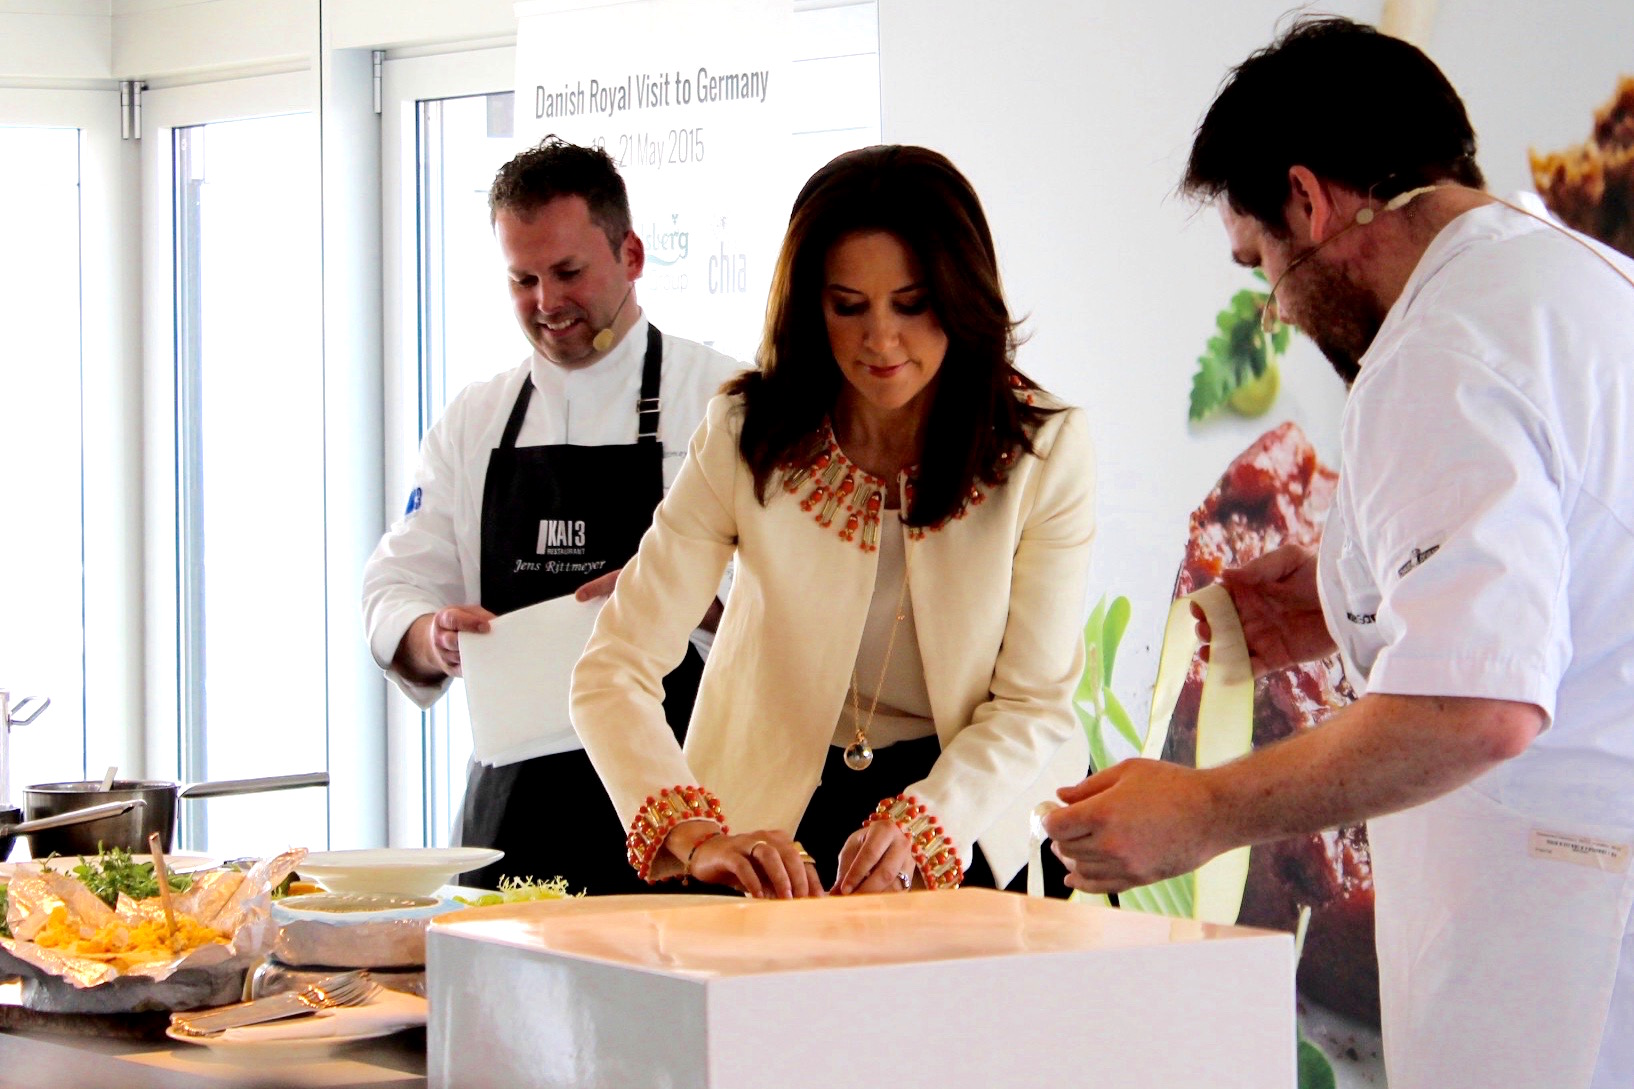 Danish Royal Visit_smf